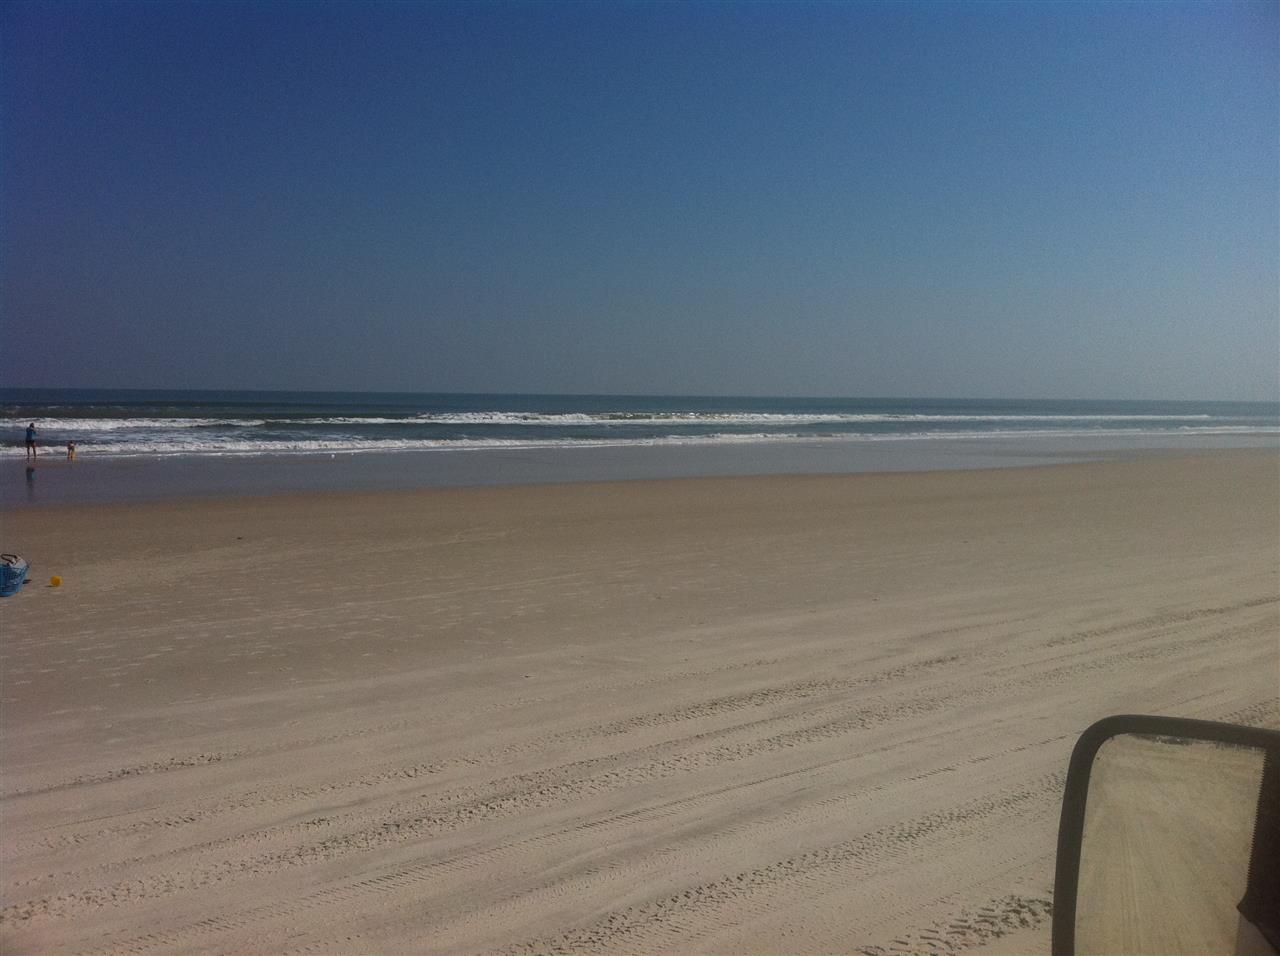 Ormond Beach, FL